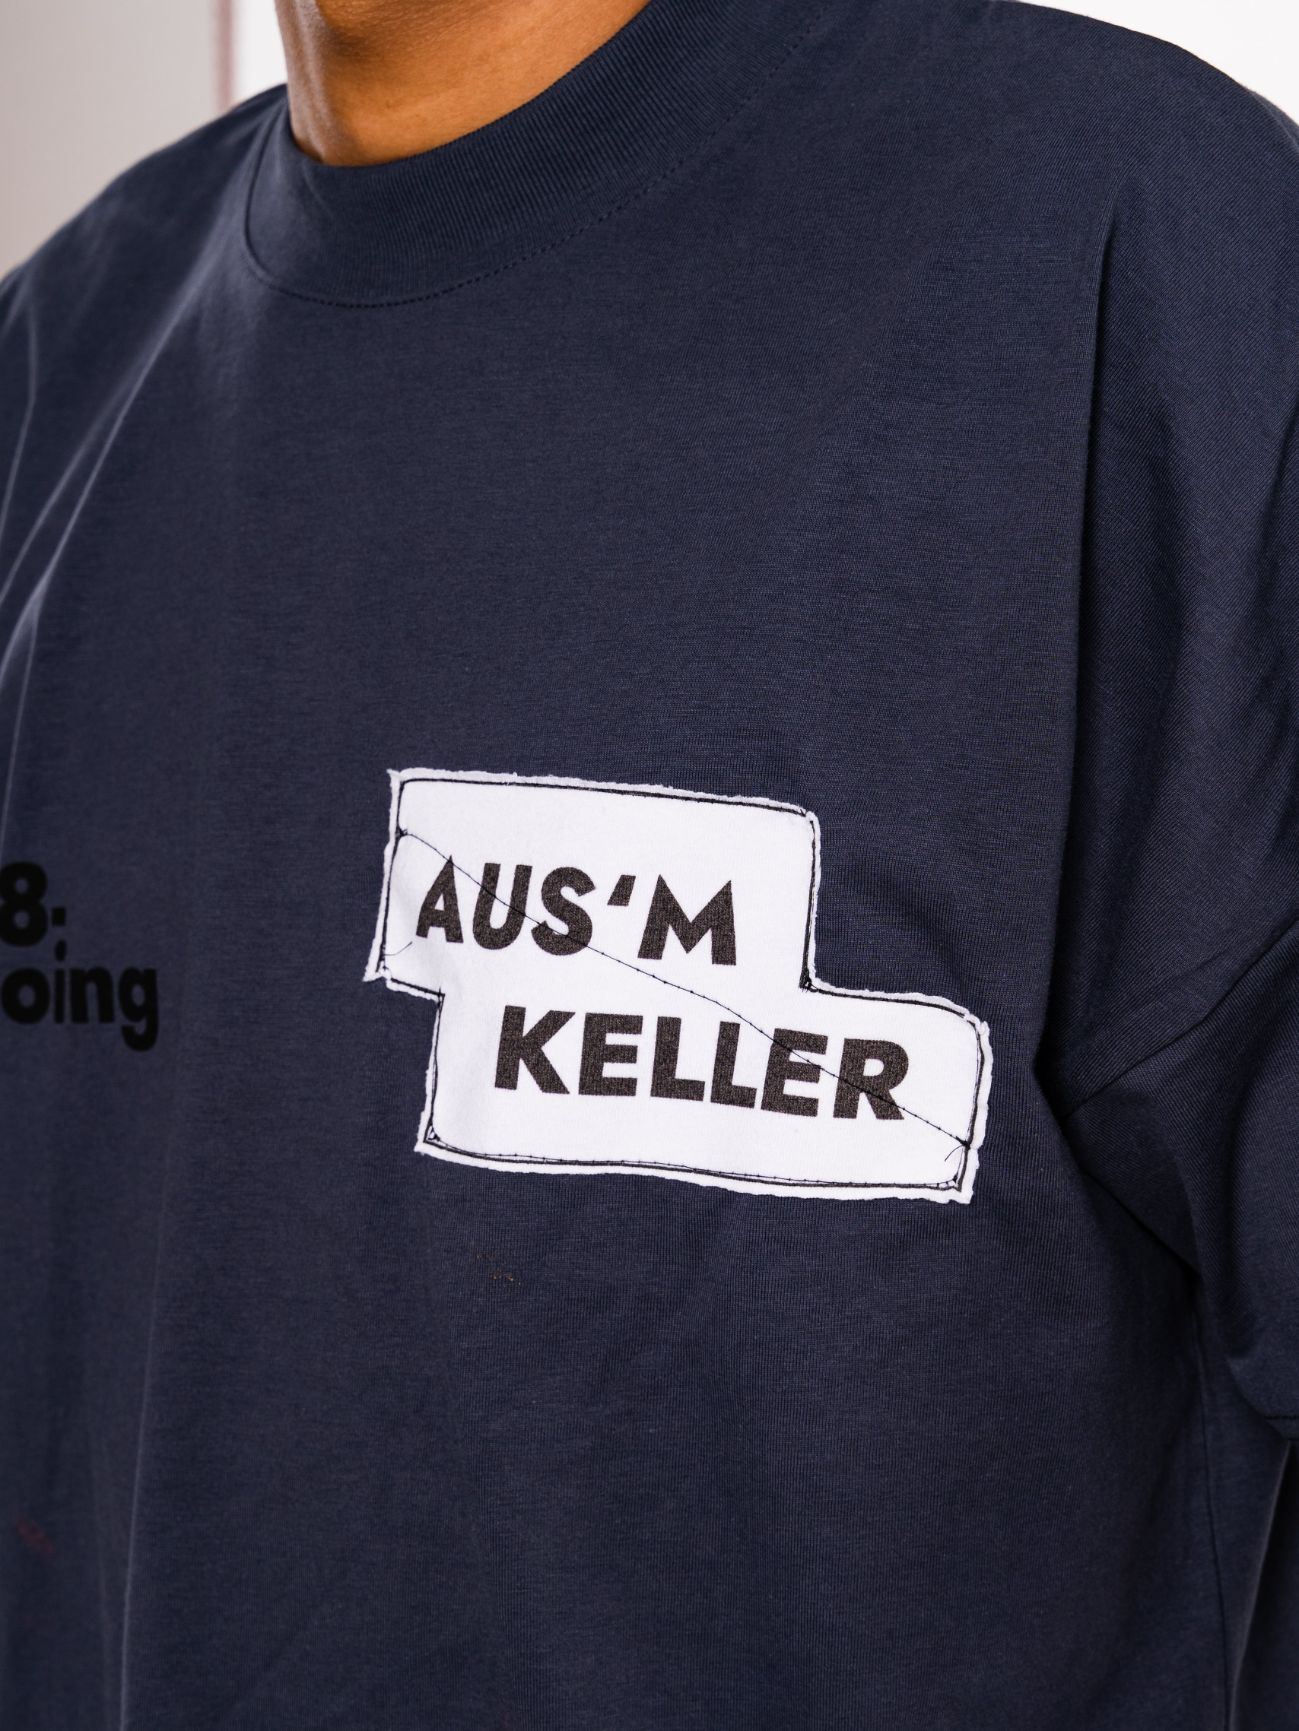 Print on Demand Aus'm Keller